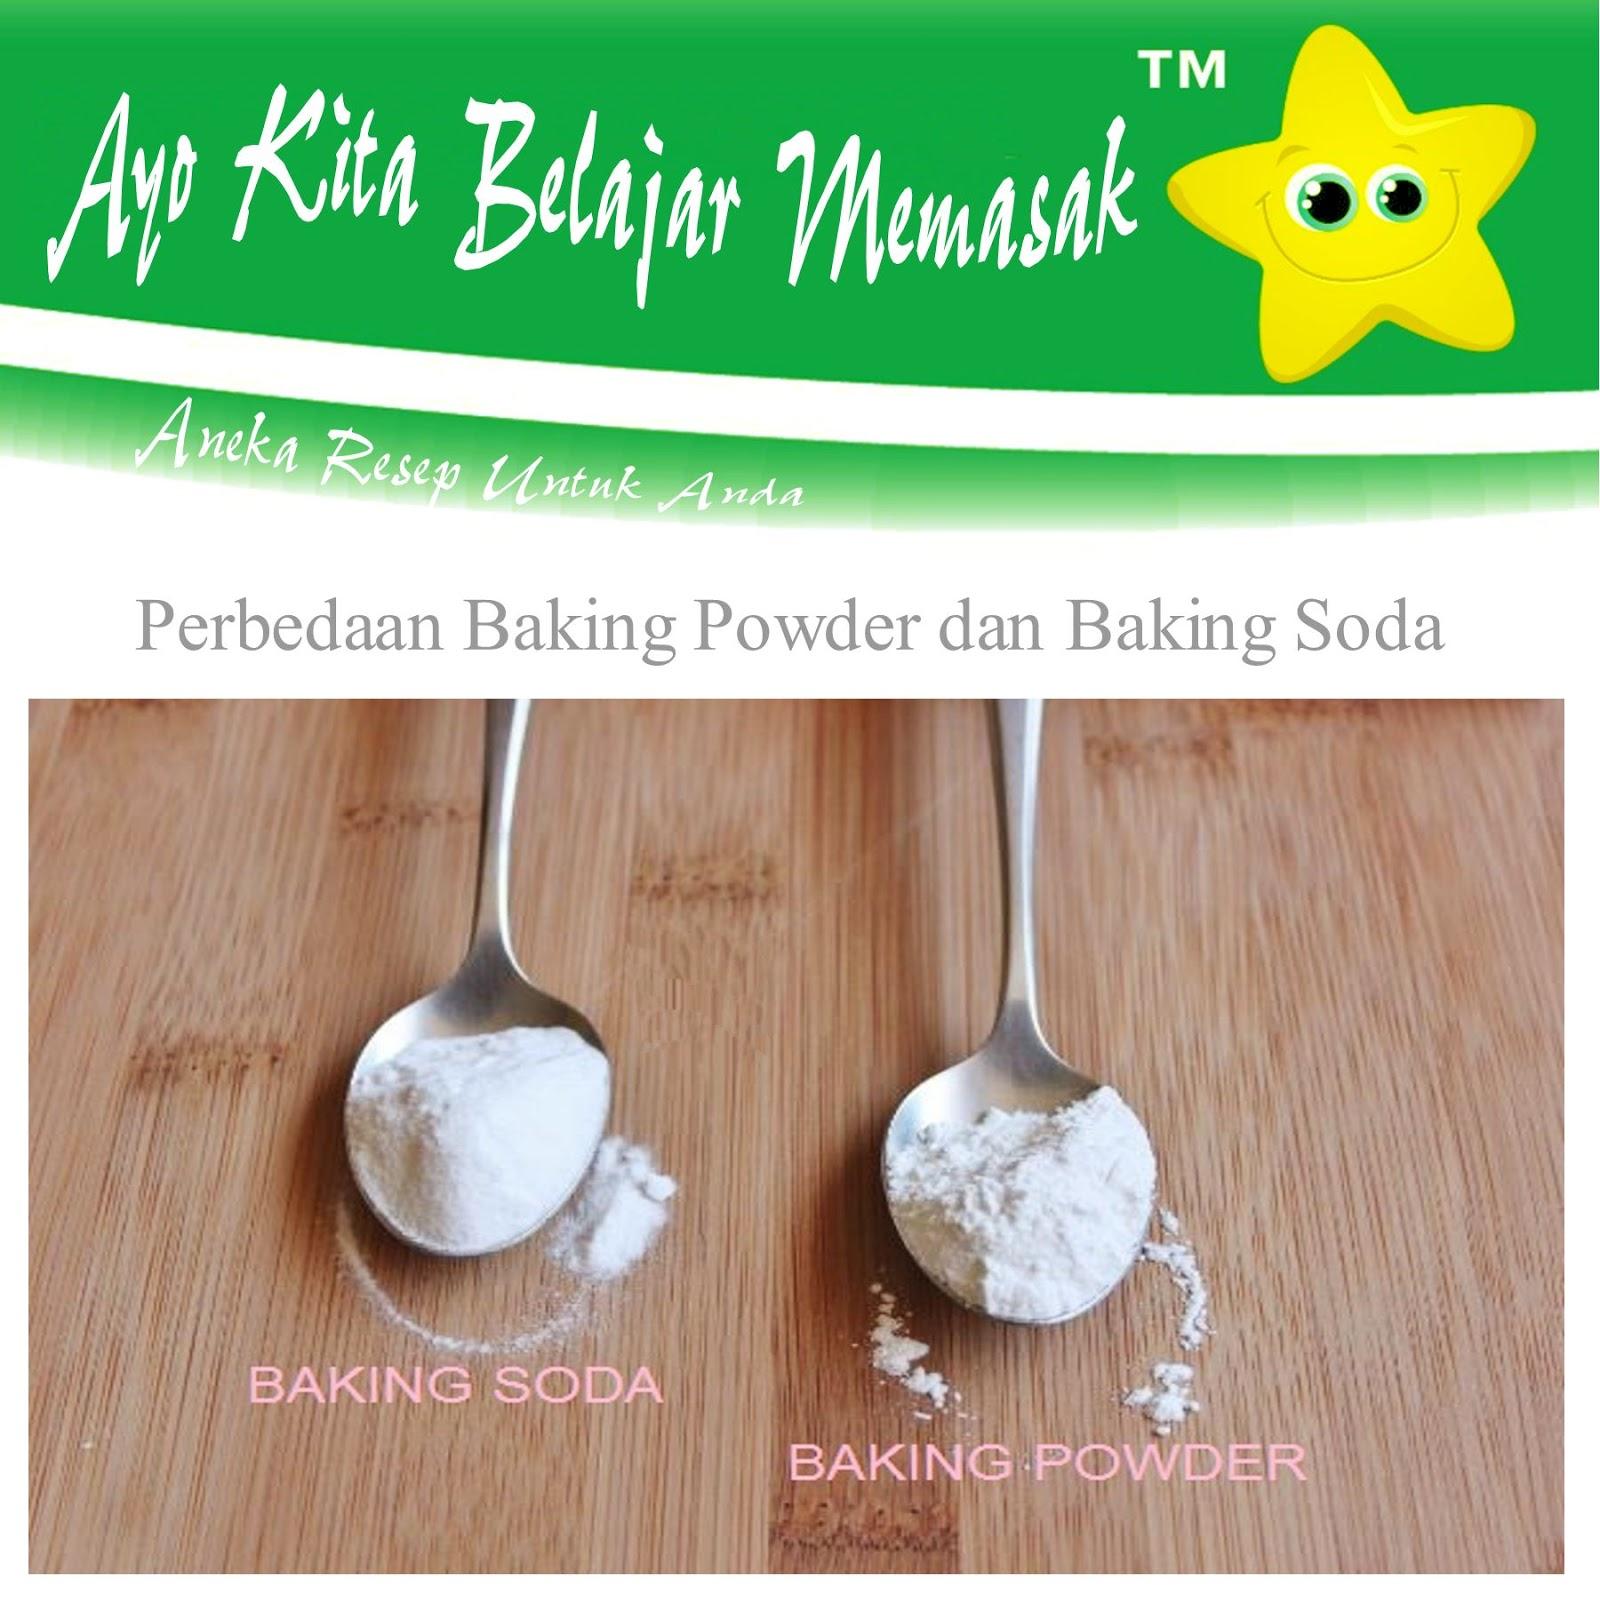 Perbedaan Baking Powder Dengan Soda Kue Baking Soda